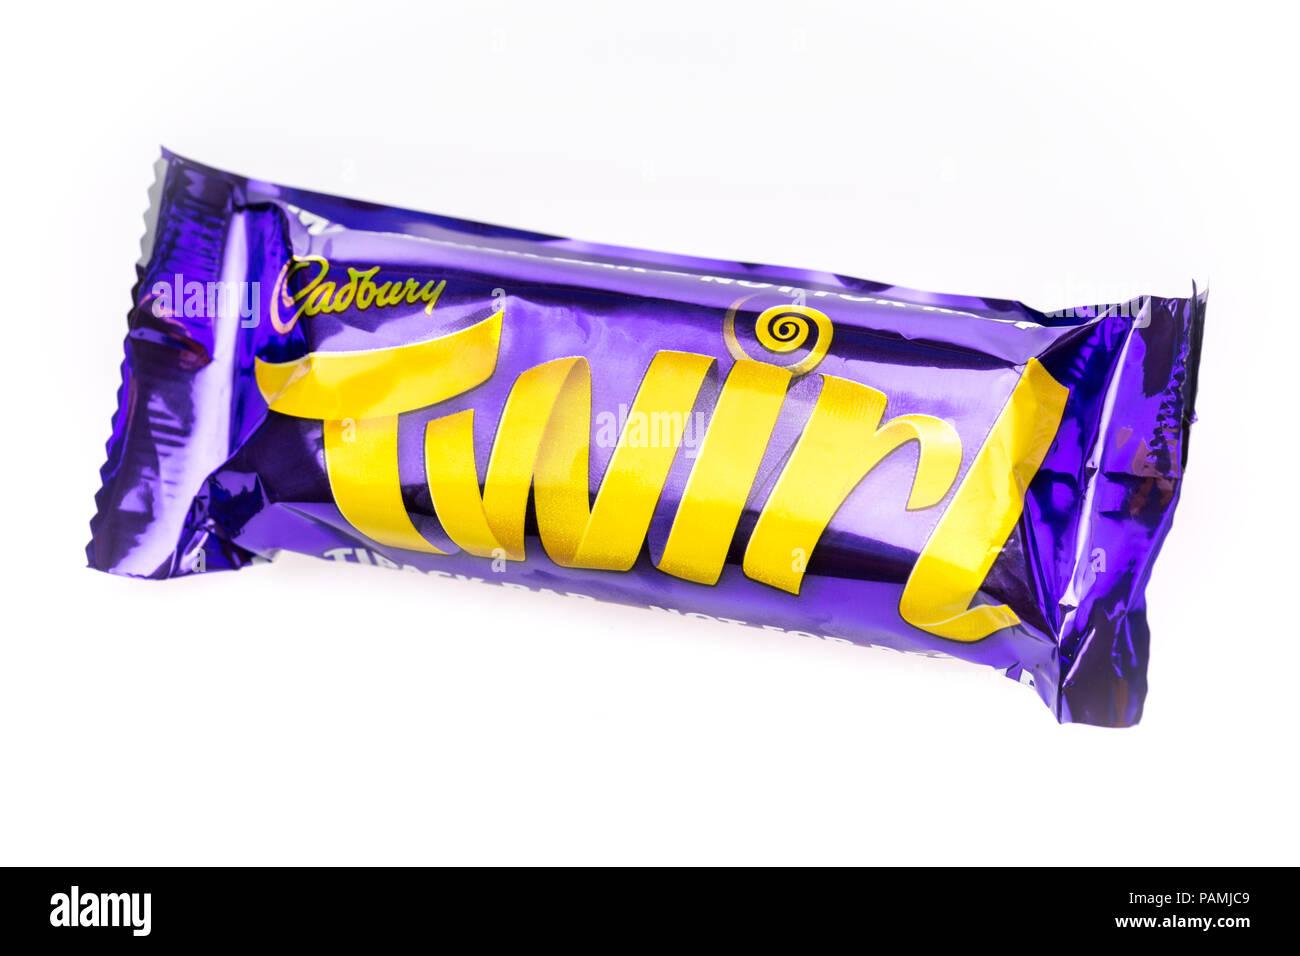 Barre de chocolat Cadbury virevolter sur un fond blanc Photo Stock